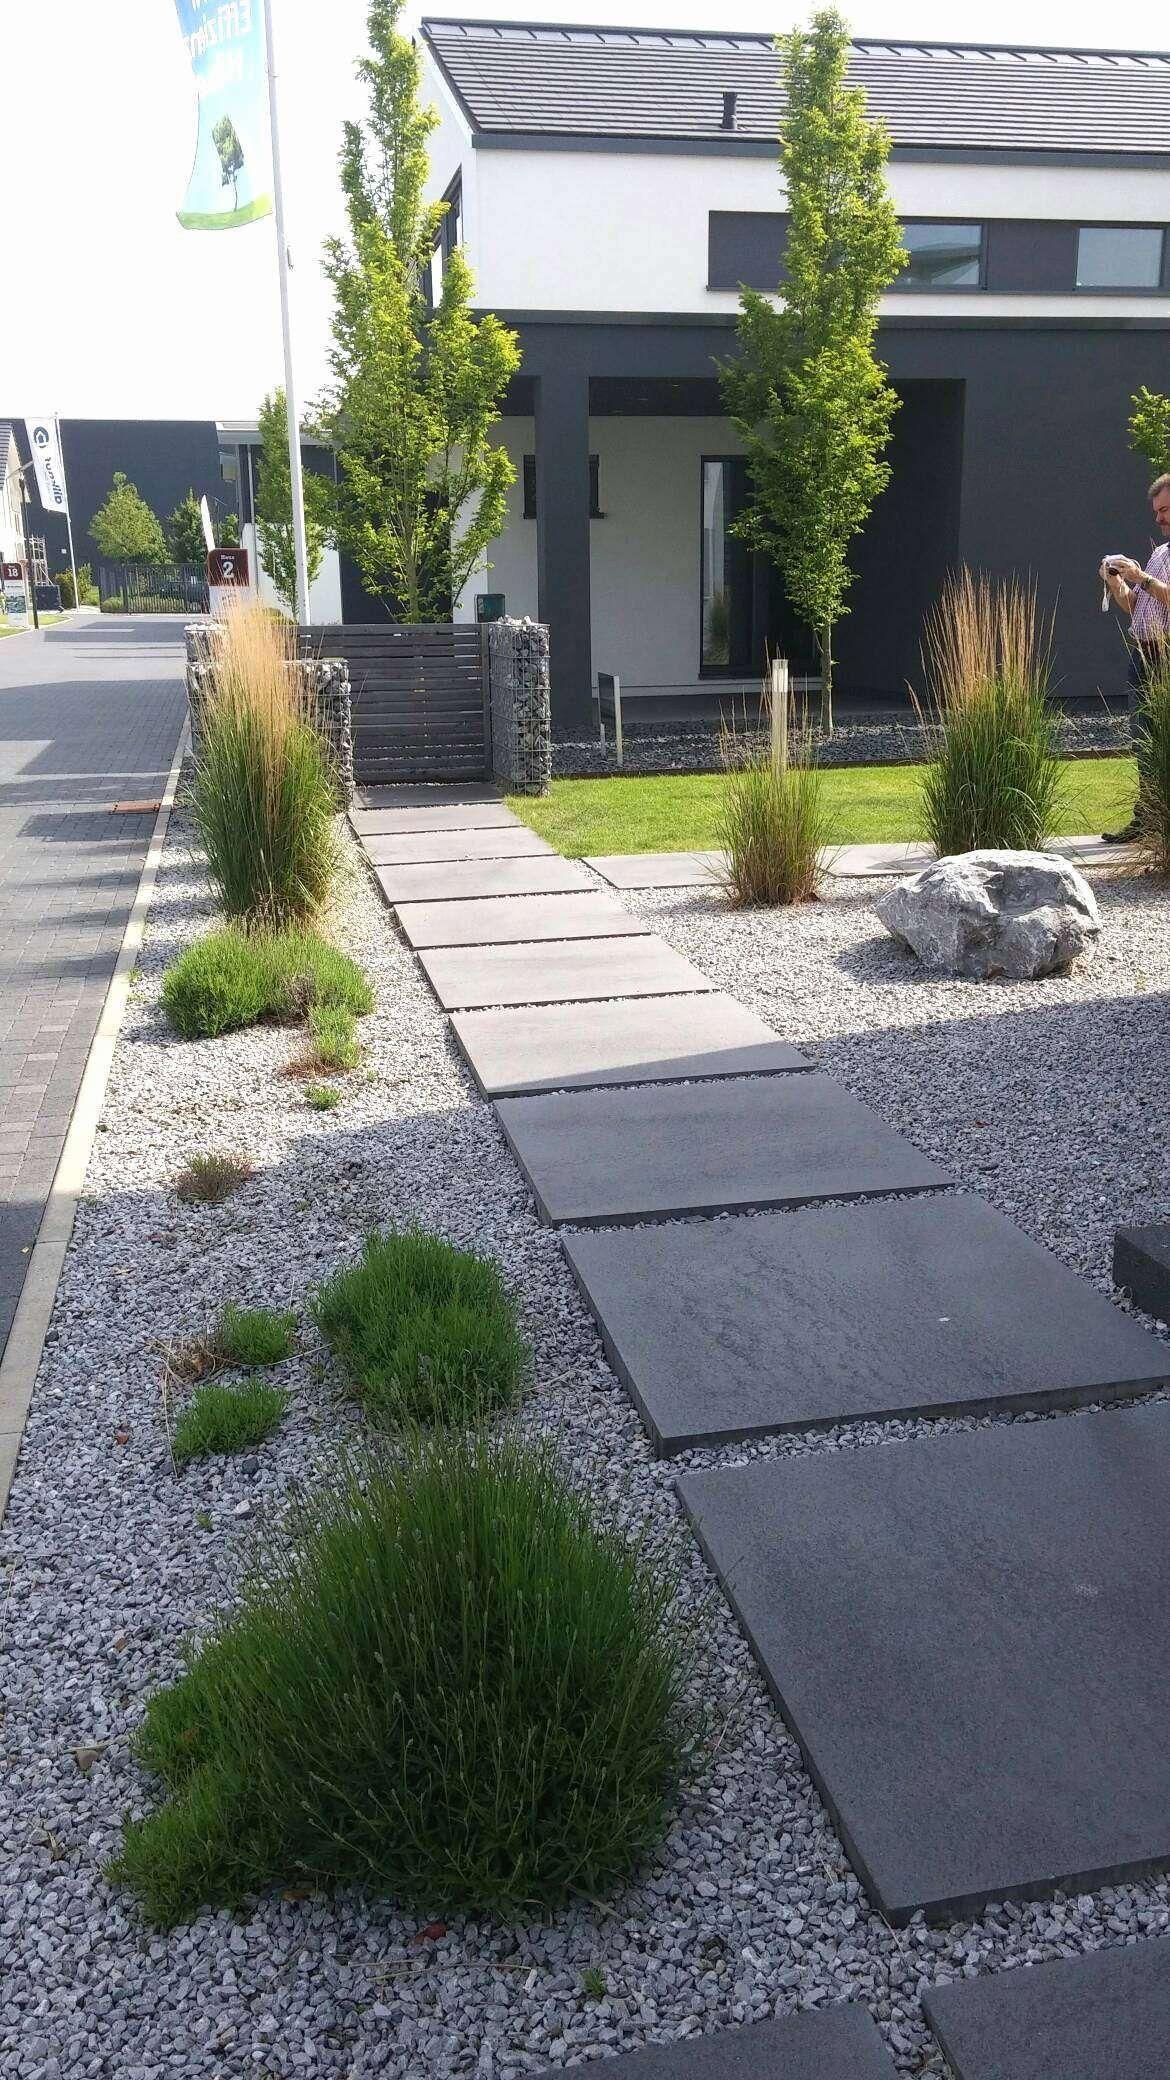 Kleiner Vorgarten Ideen Elegant Garten Ideas Garten Anlegen Lovely Aussenleuchten Garten 0d